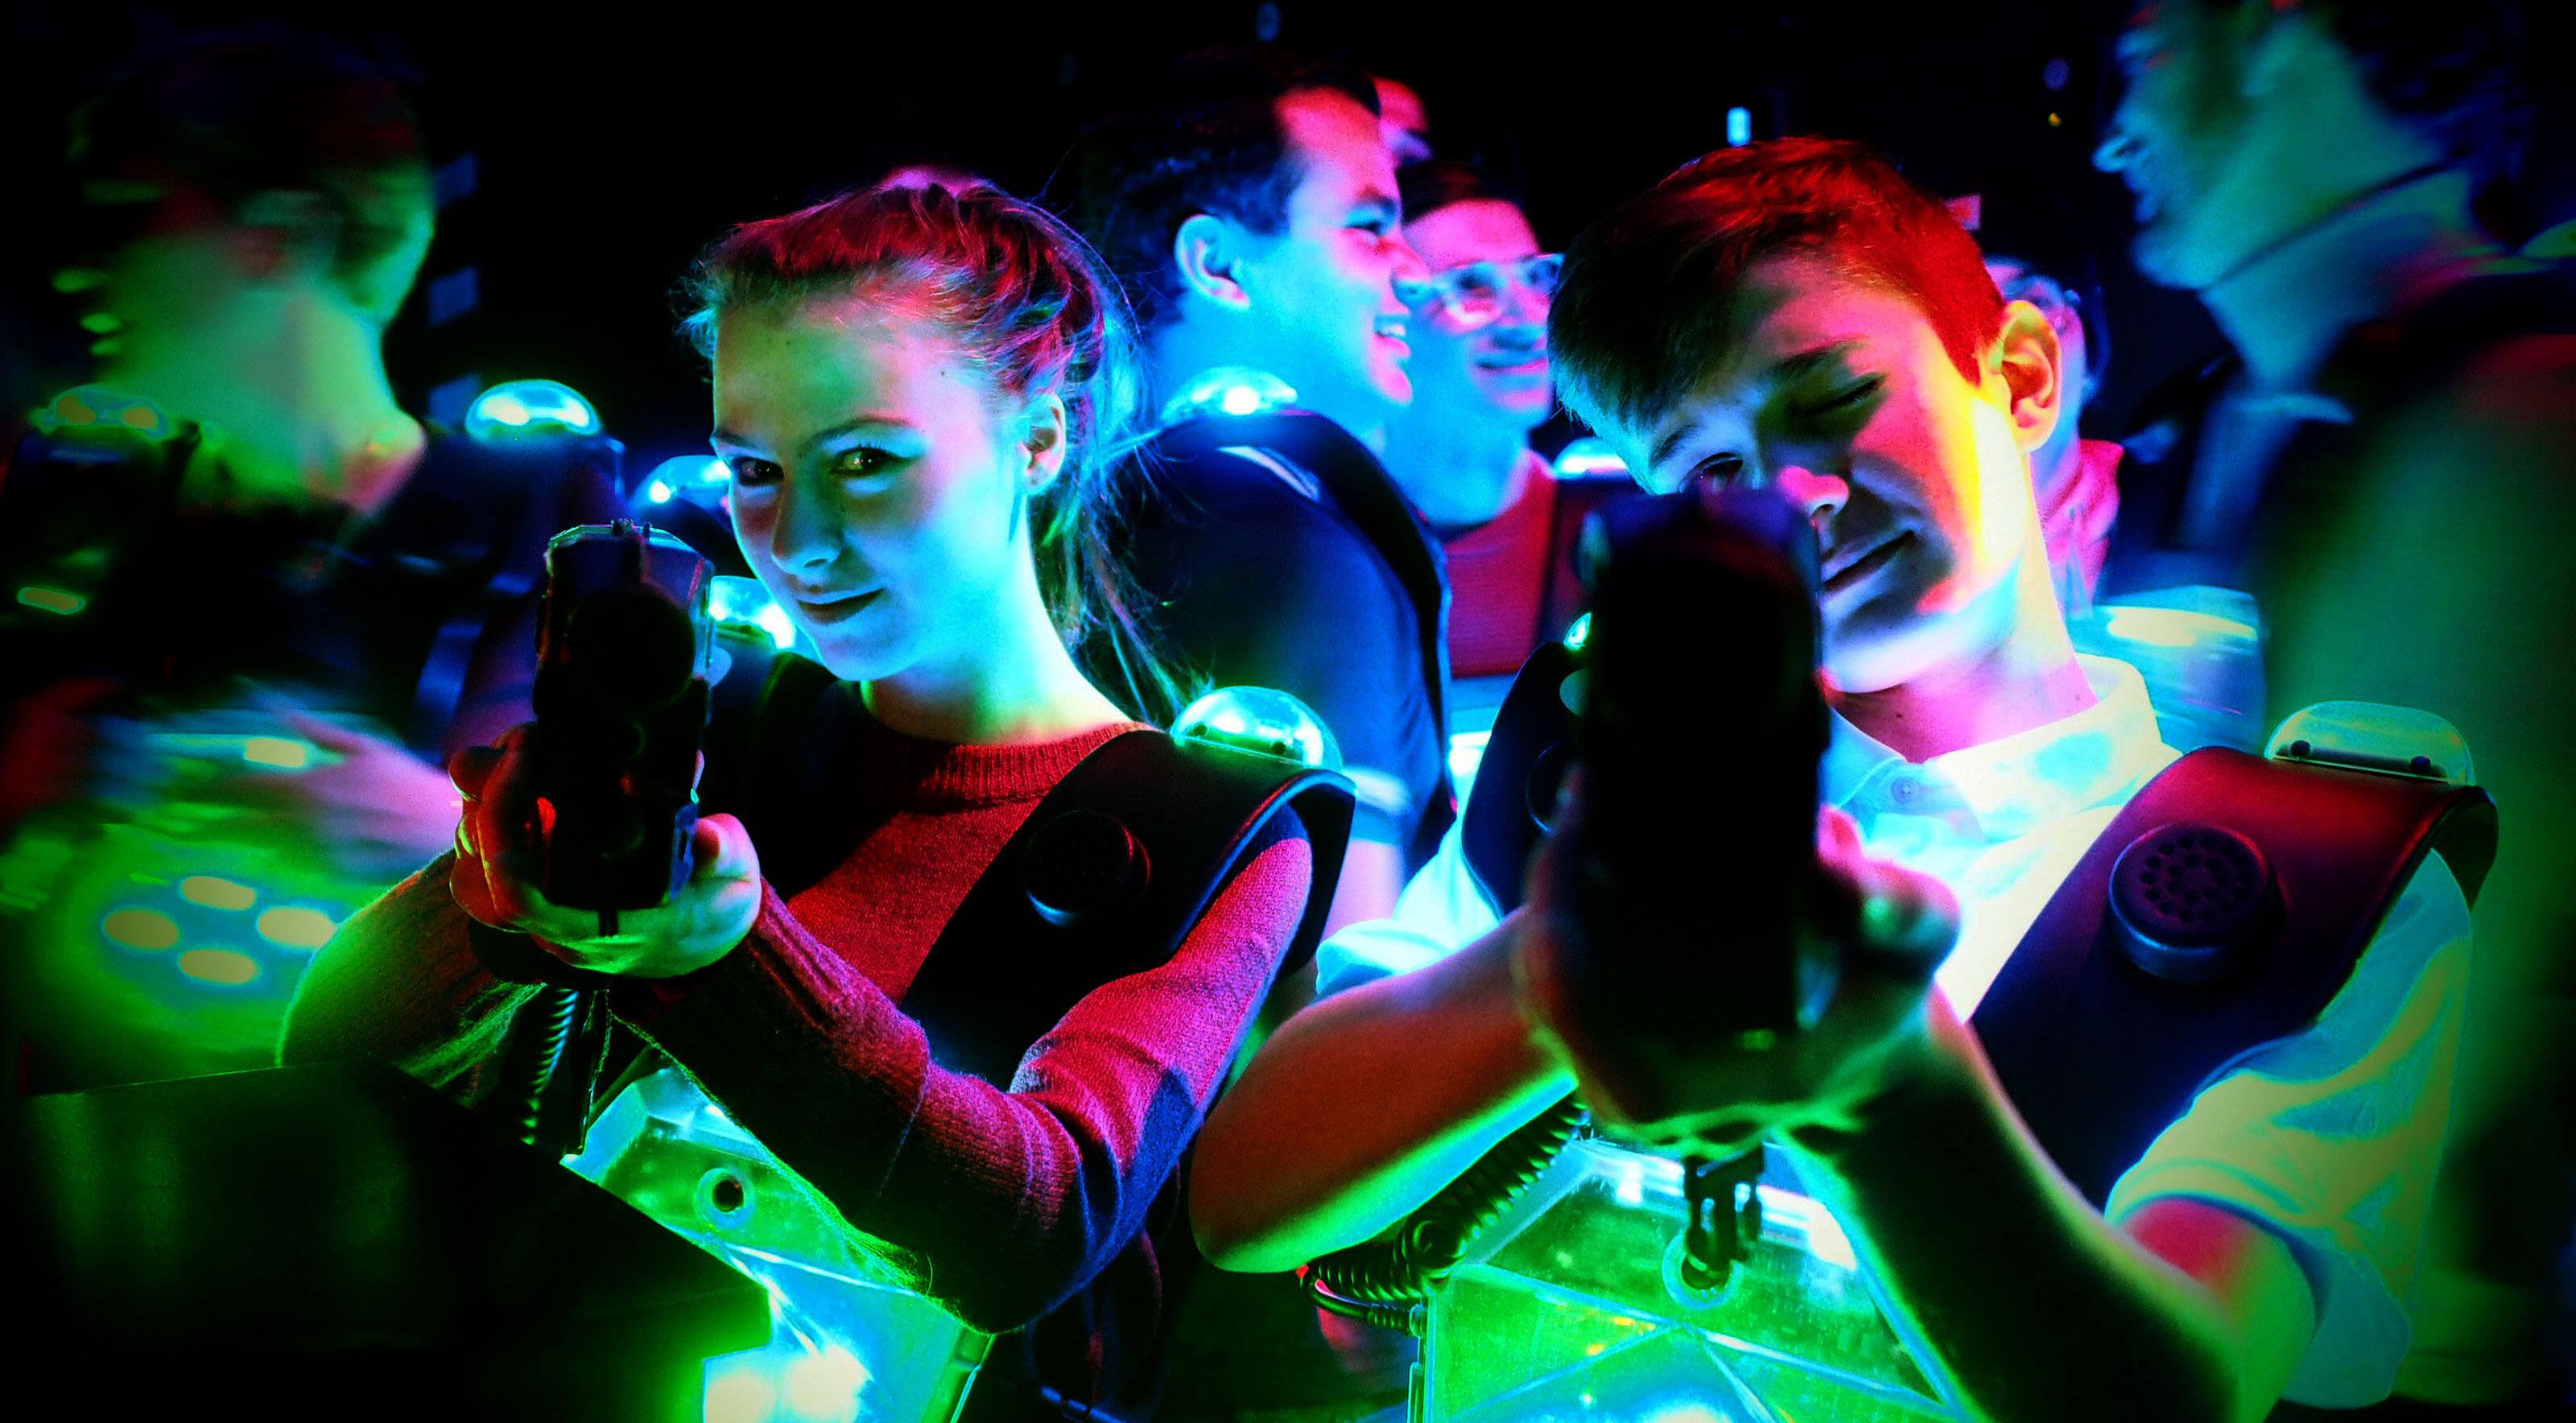 Lasergamen bij Powerzone